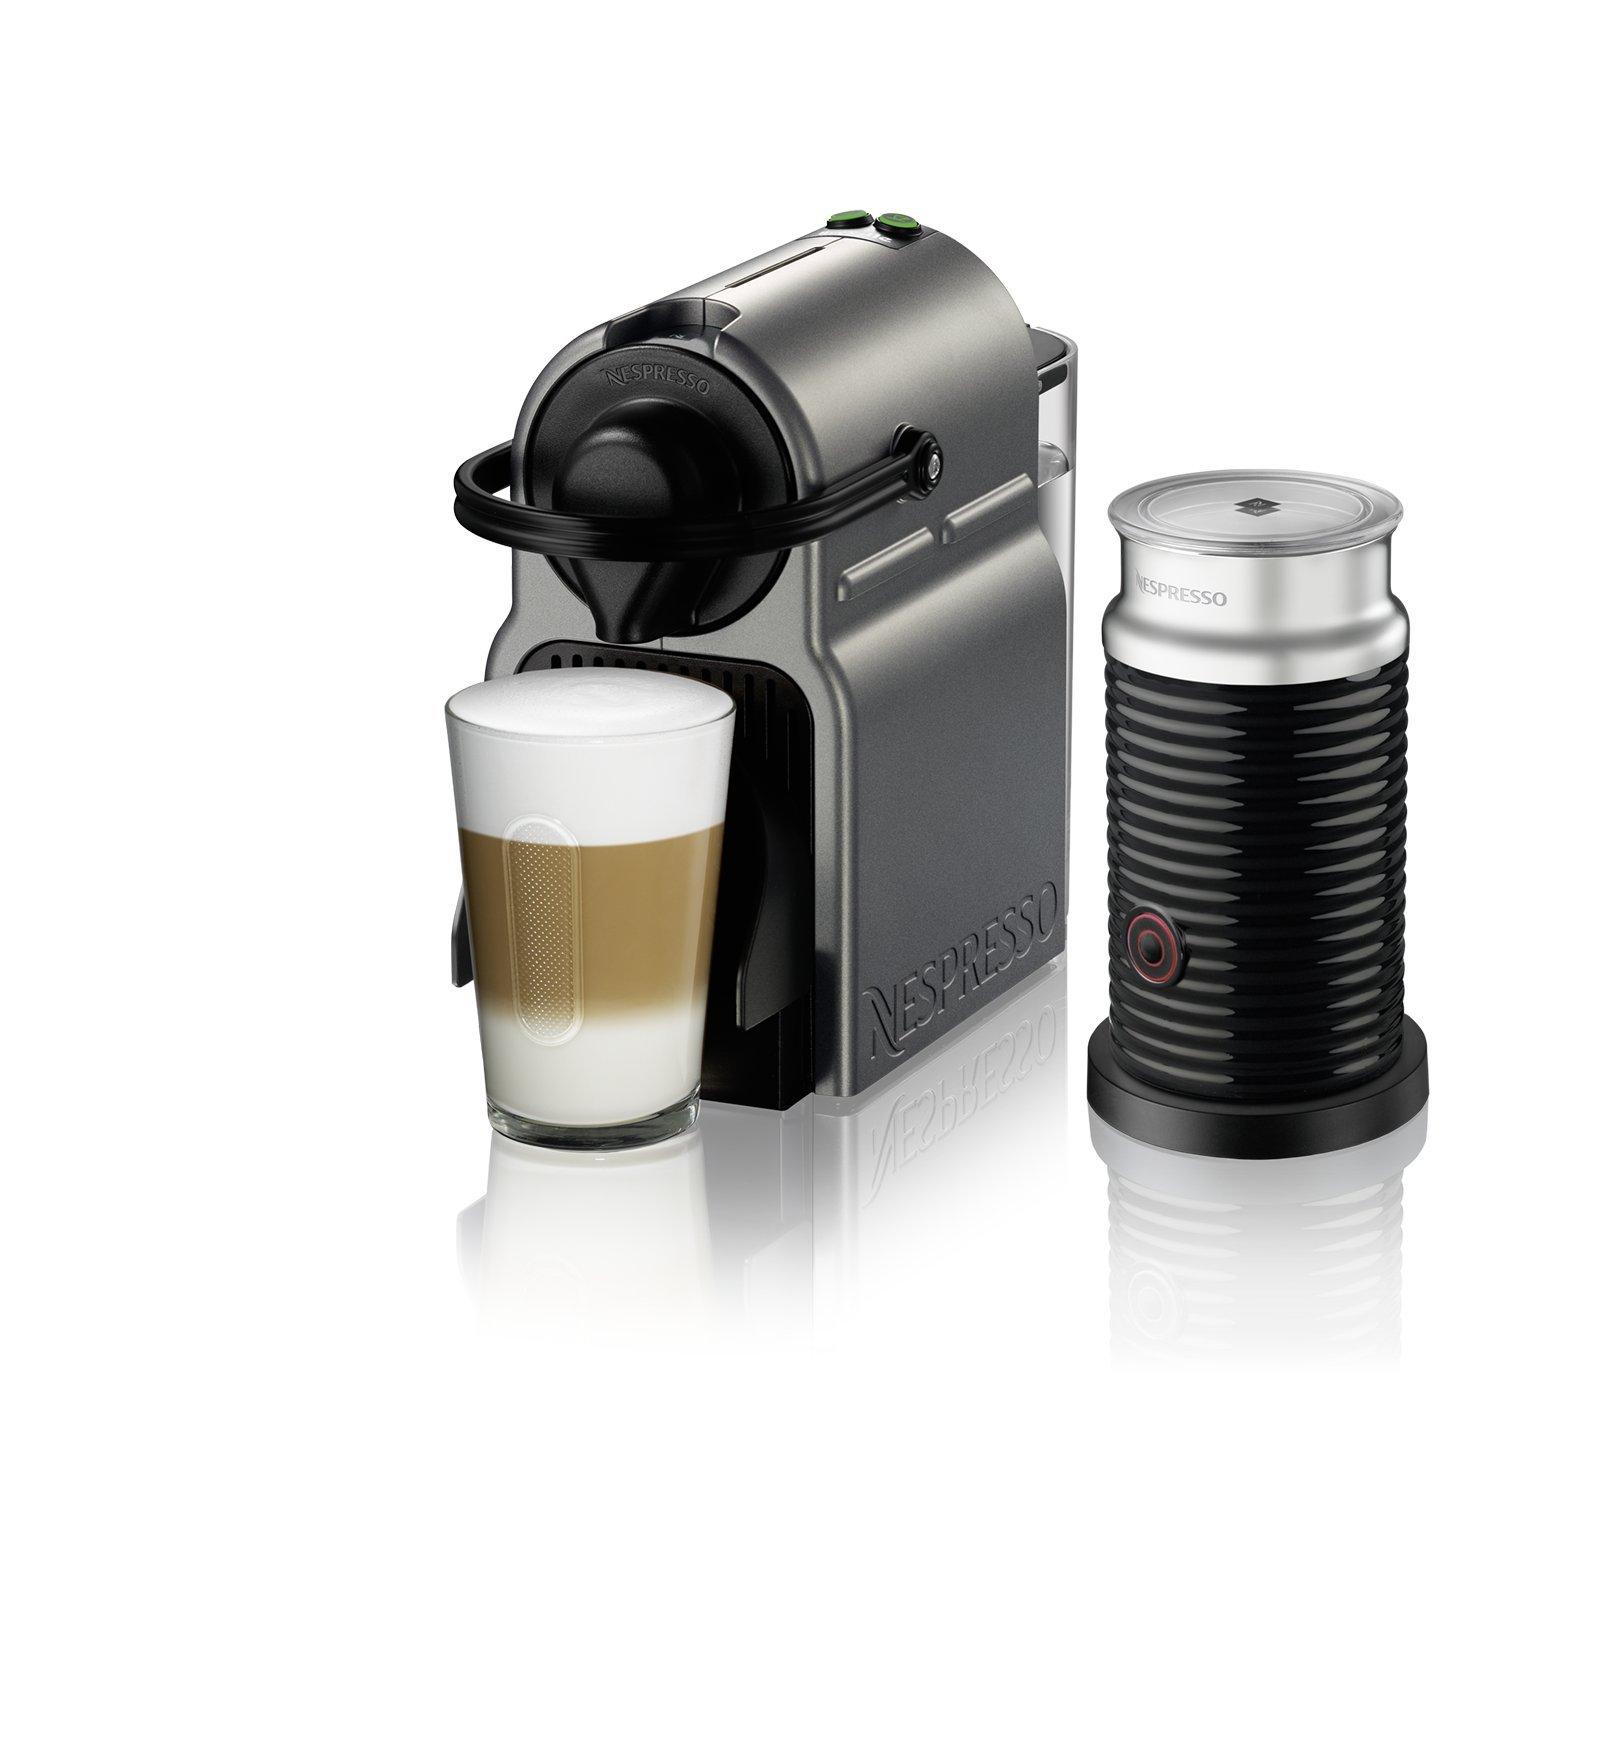 Breville-Nespresso USA BEC150TTN1AUC1 Vertuo Espresso Machine, Titan by Breville-Nespresso USA